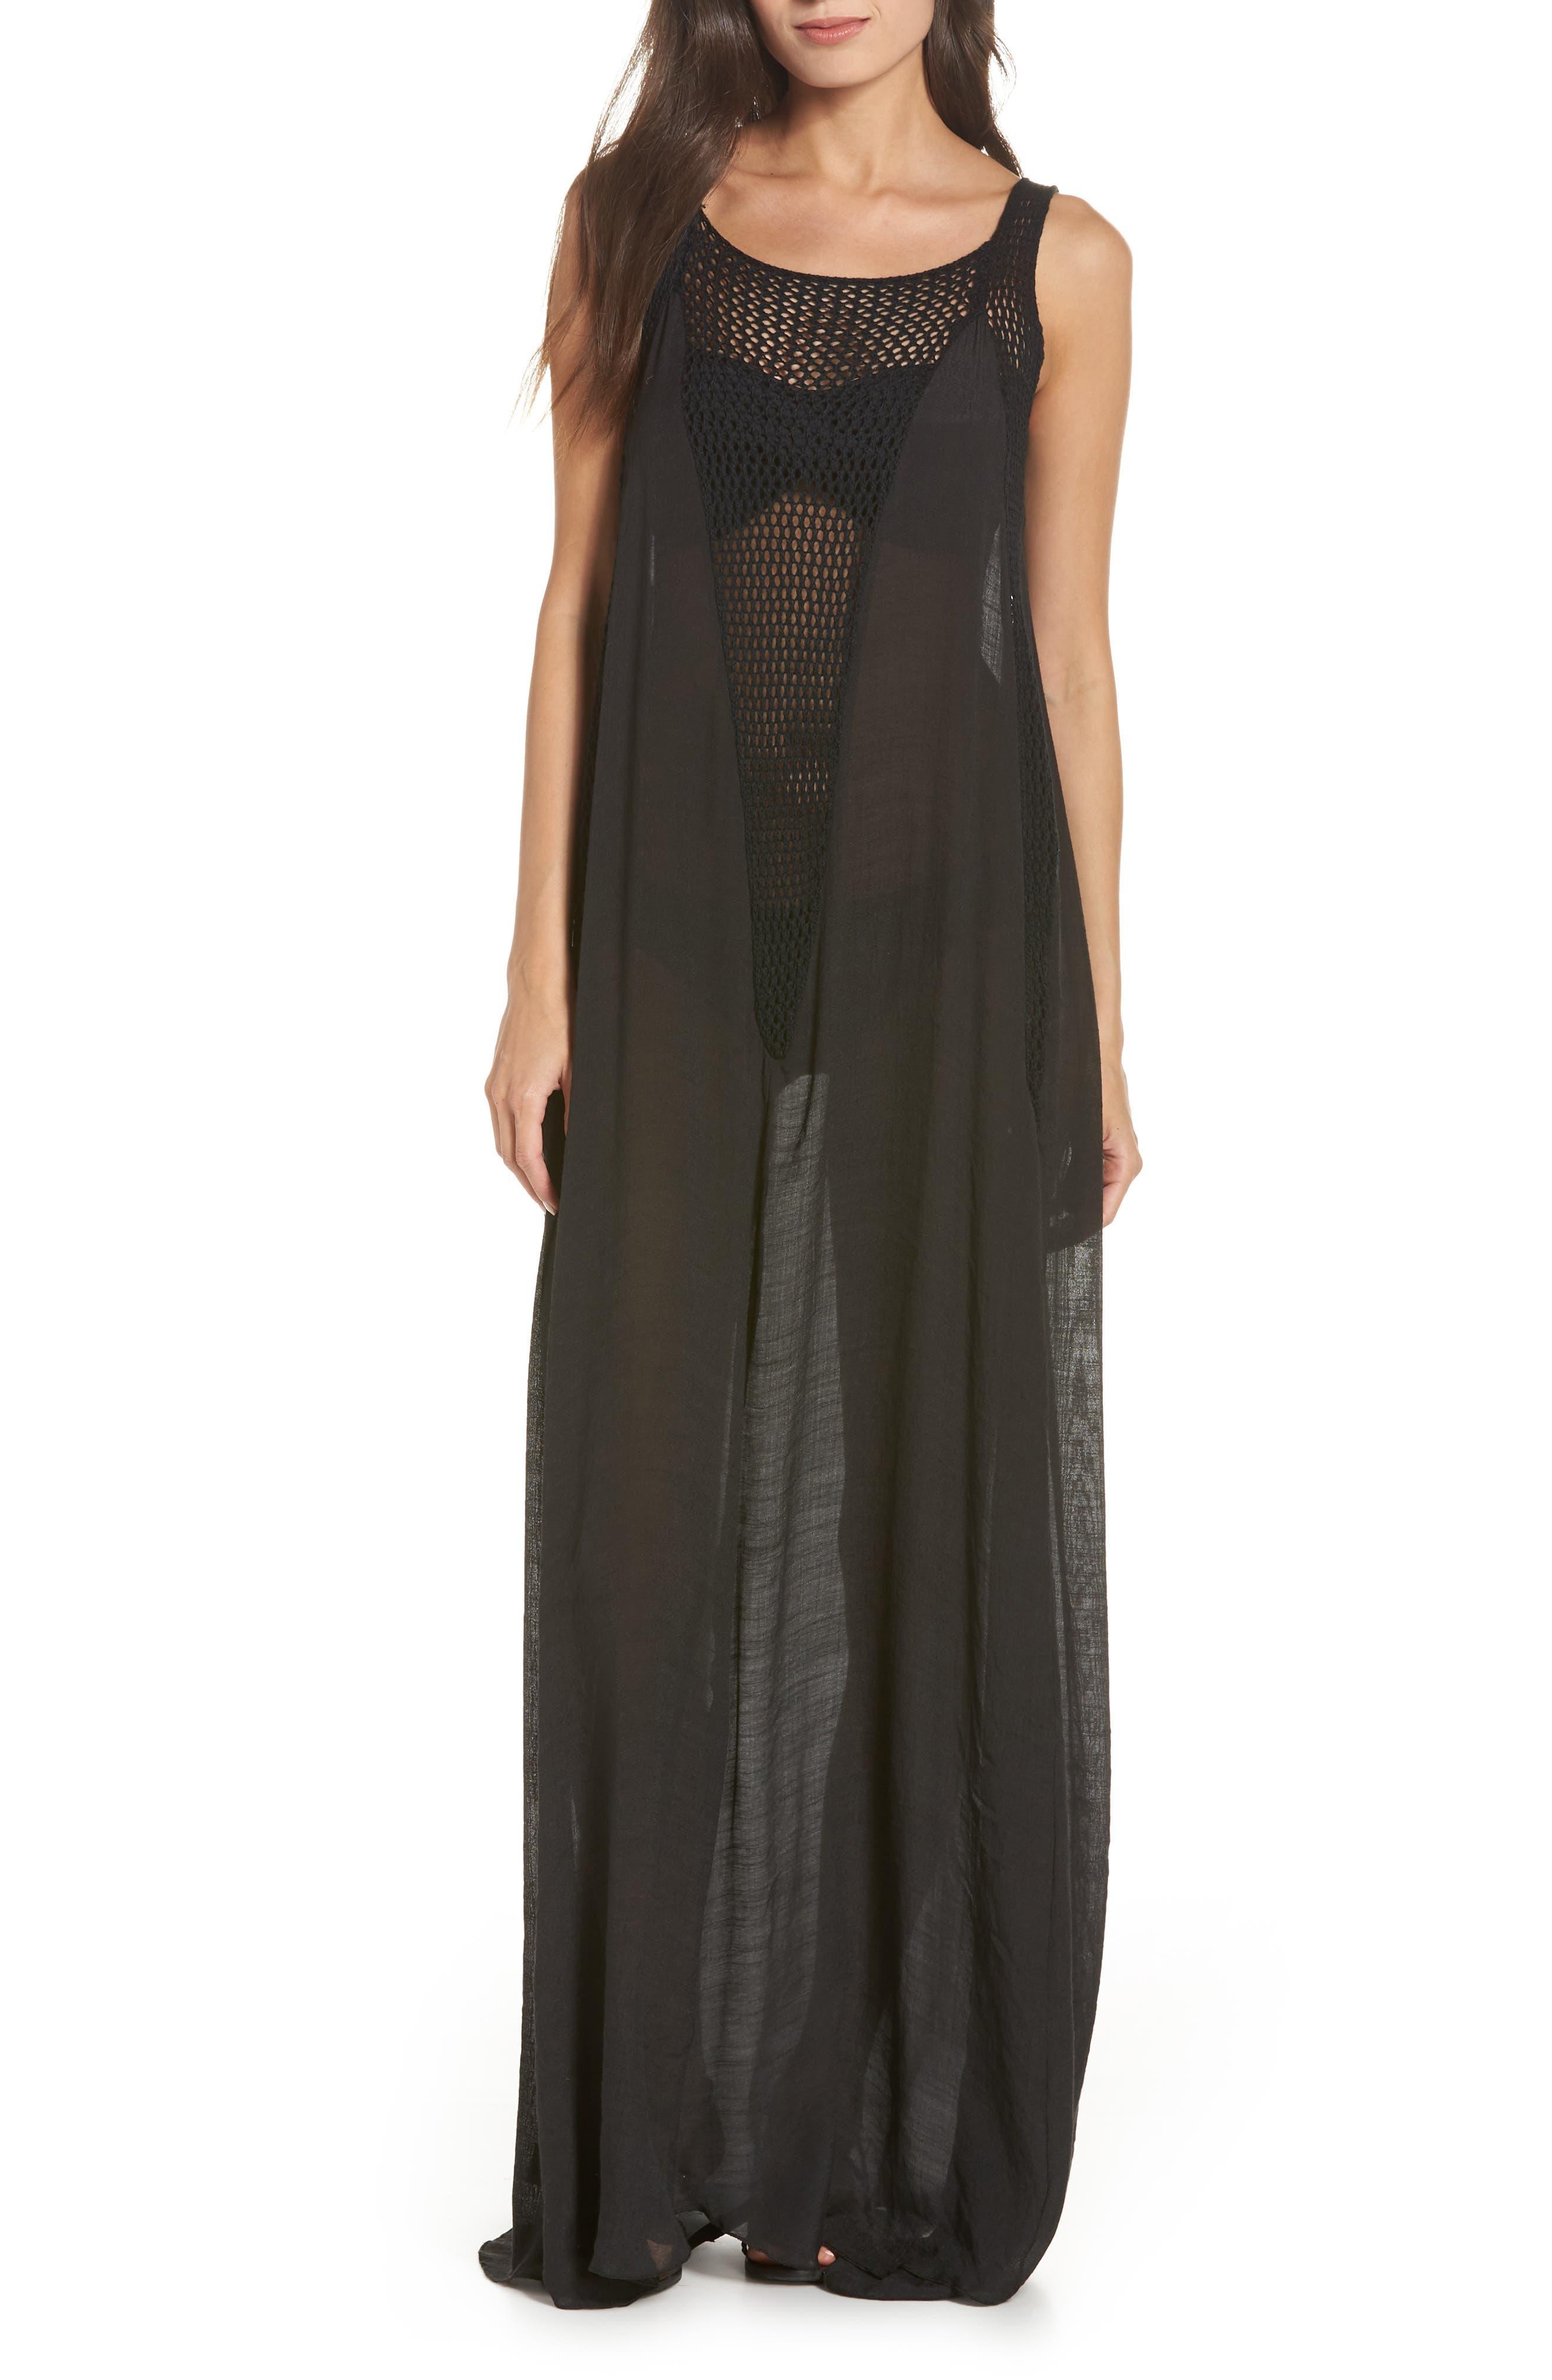 Elan Crochet Inset Cover-Up Maxi Dress, Black